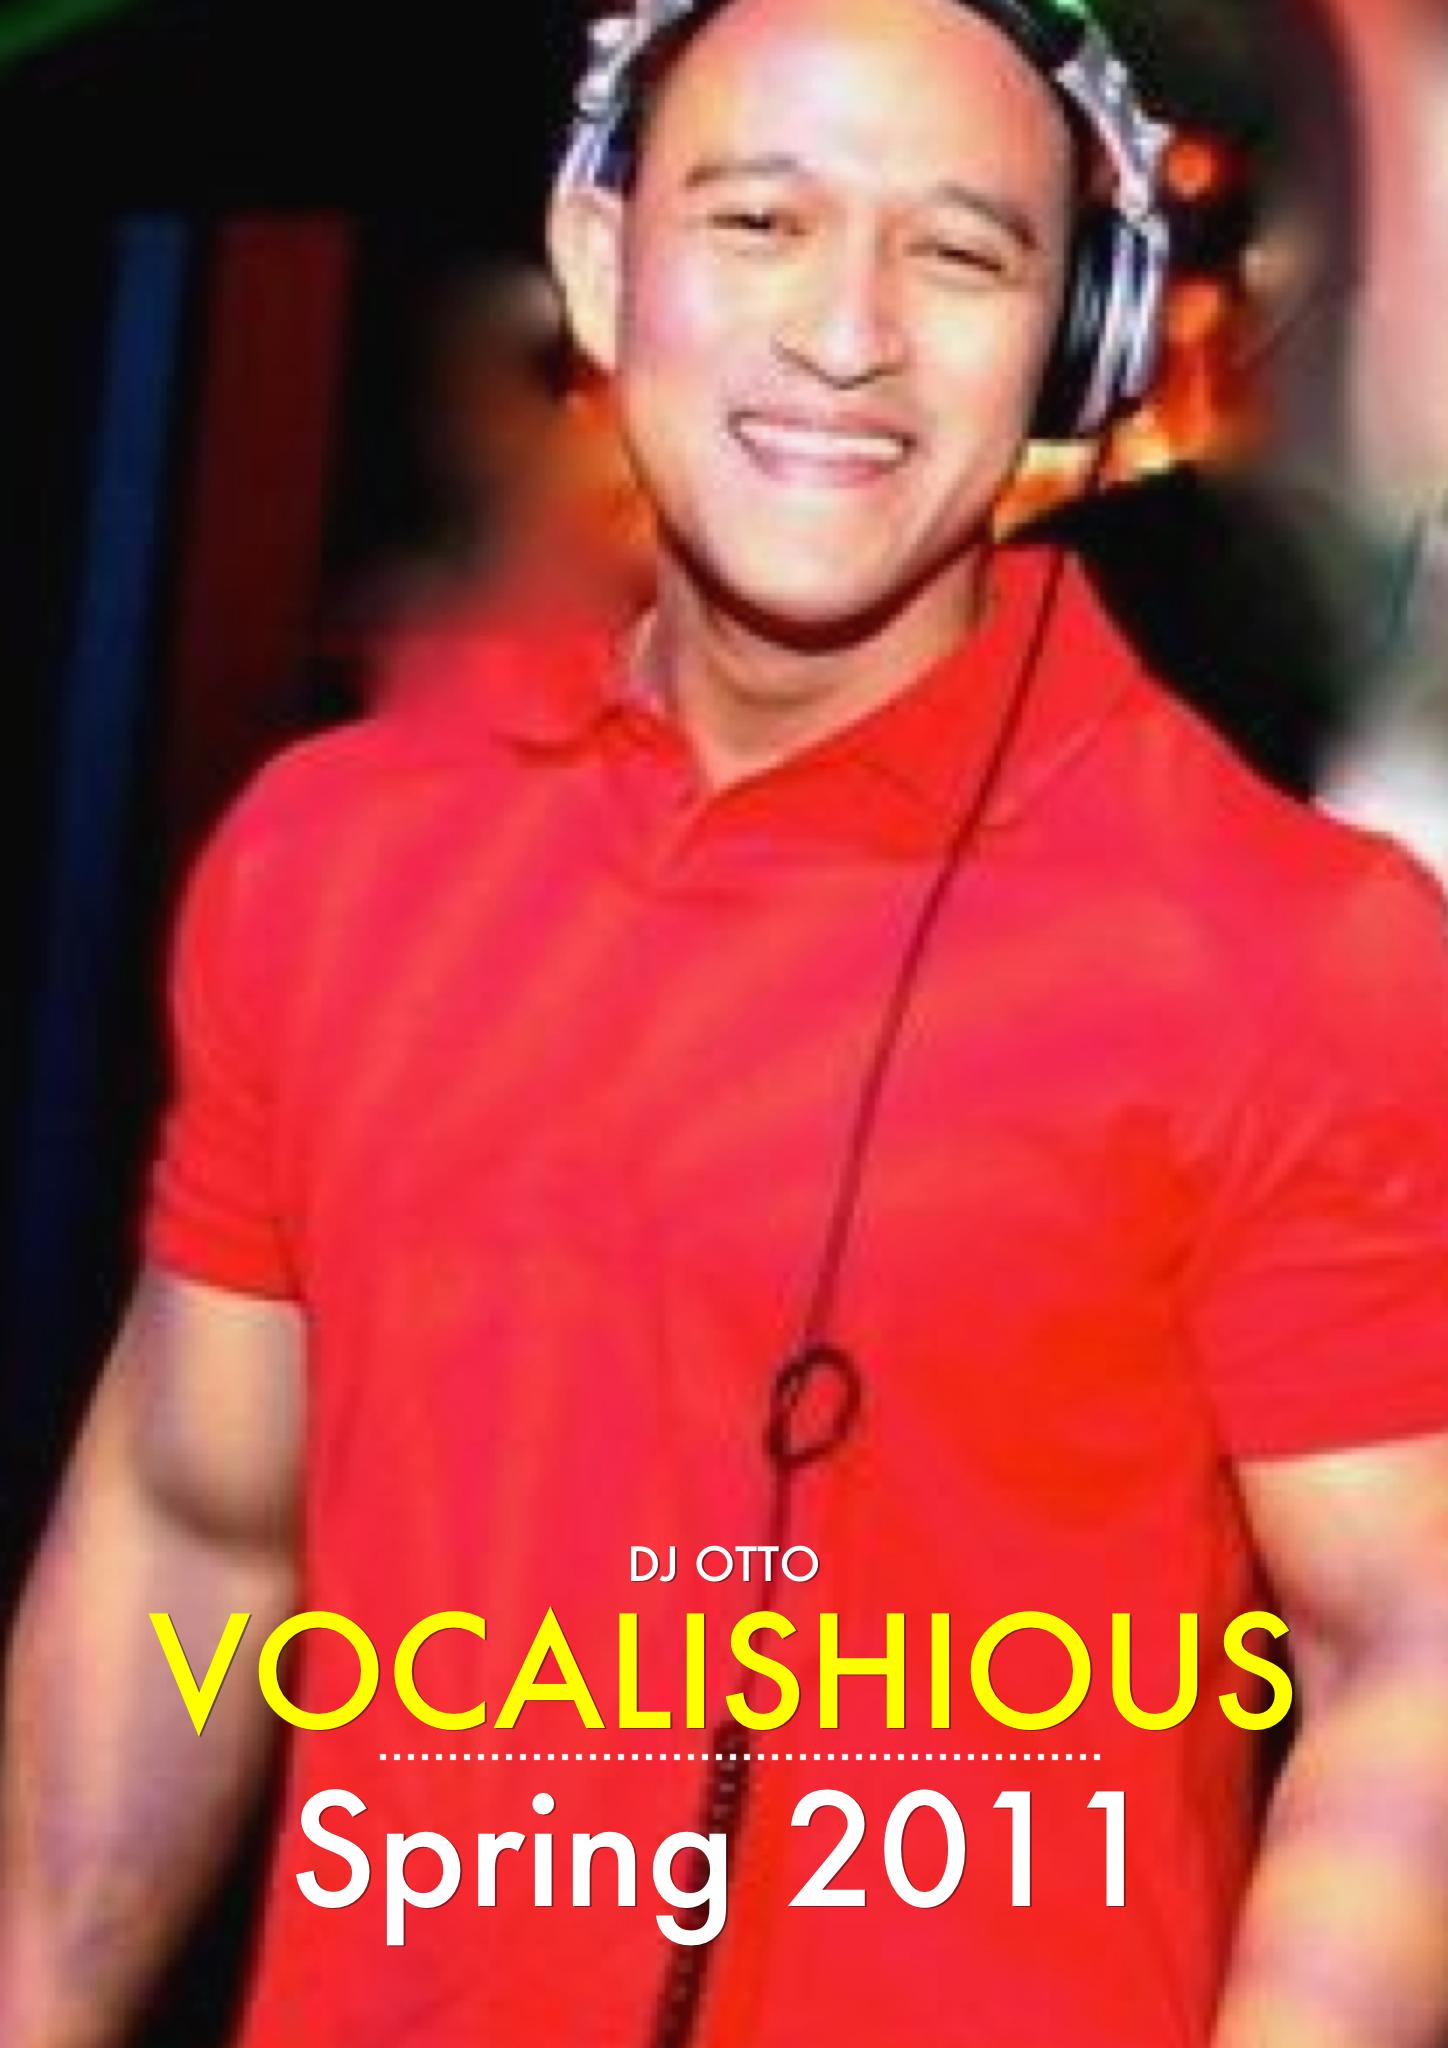 DJ OTTO - VOCALISHIOUS (SPRING 2011)